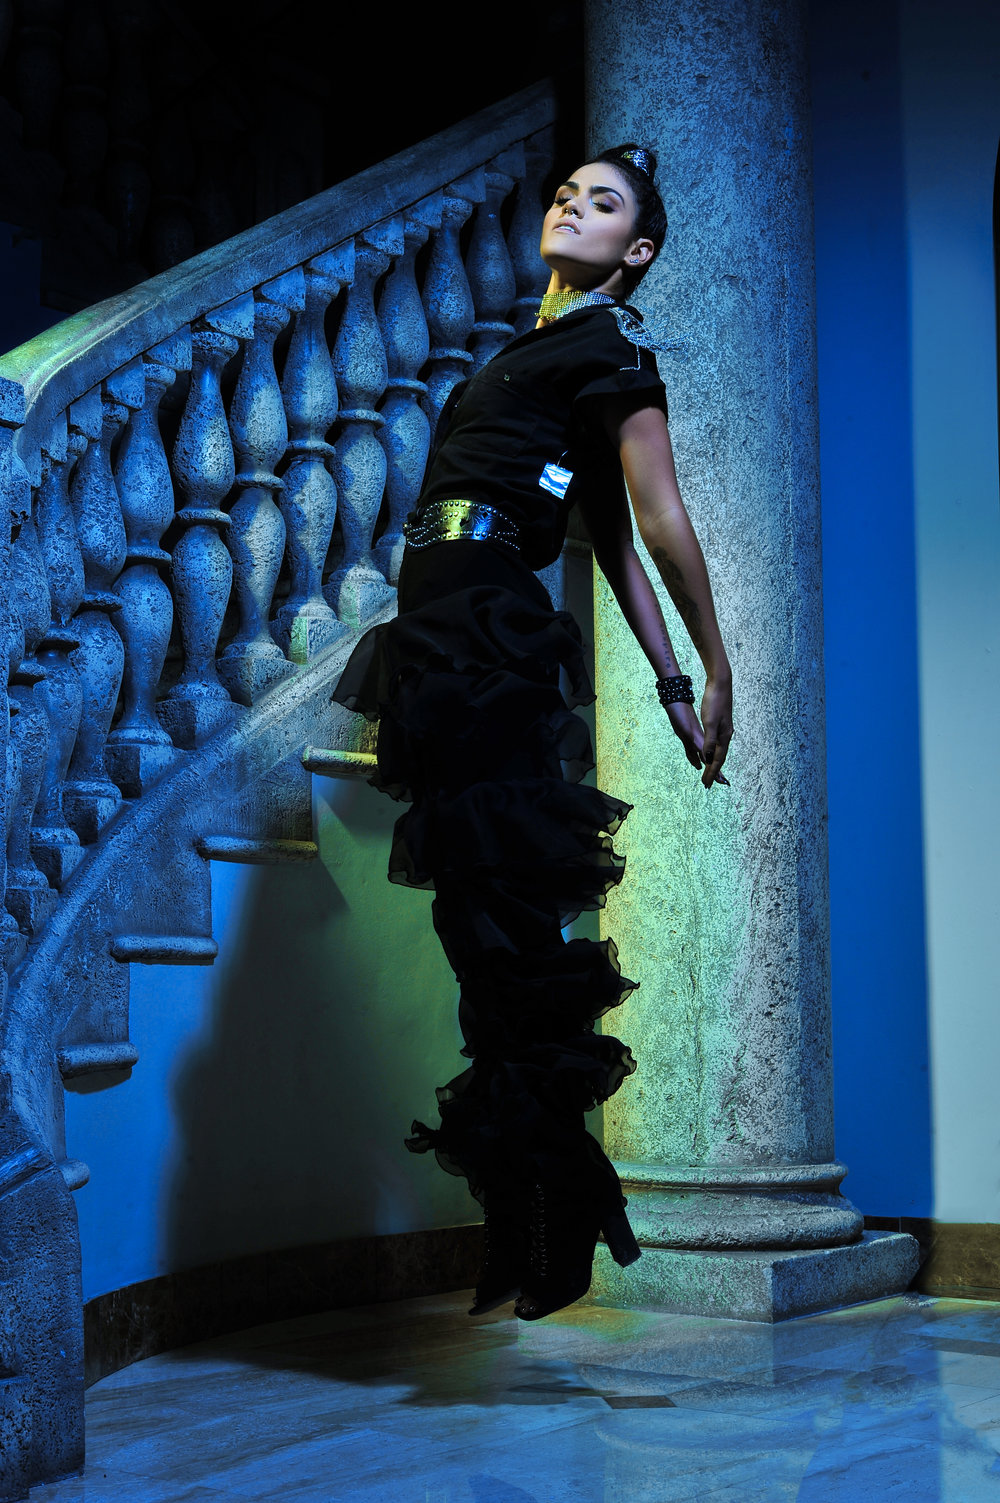 model-beefiyaa-art-crazy-photo-g-photography-fashion-stylist-illy-perez9.JPG